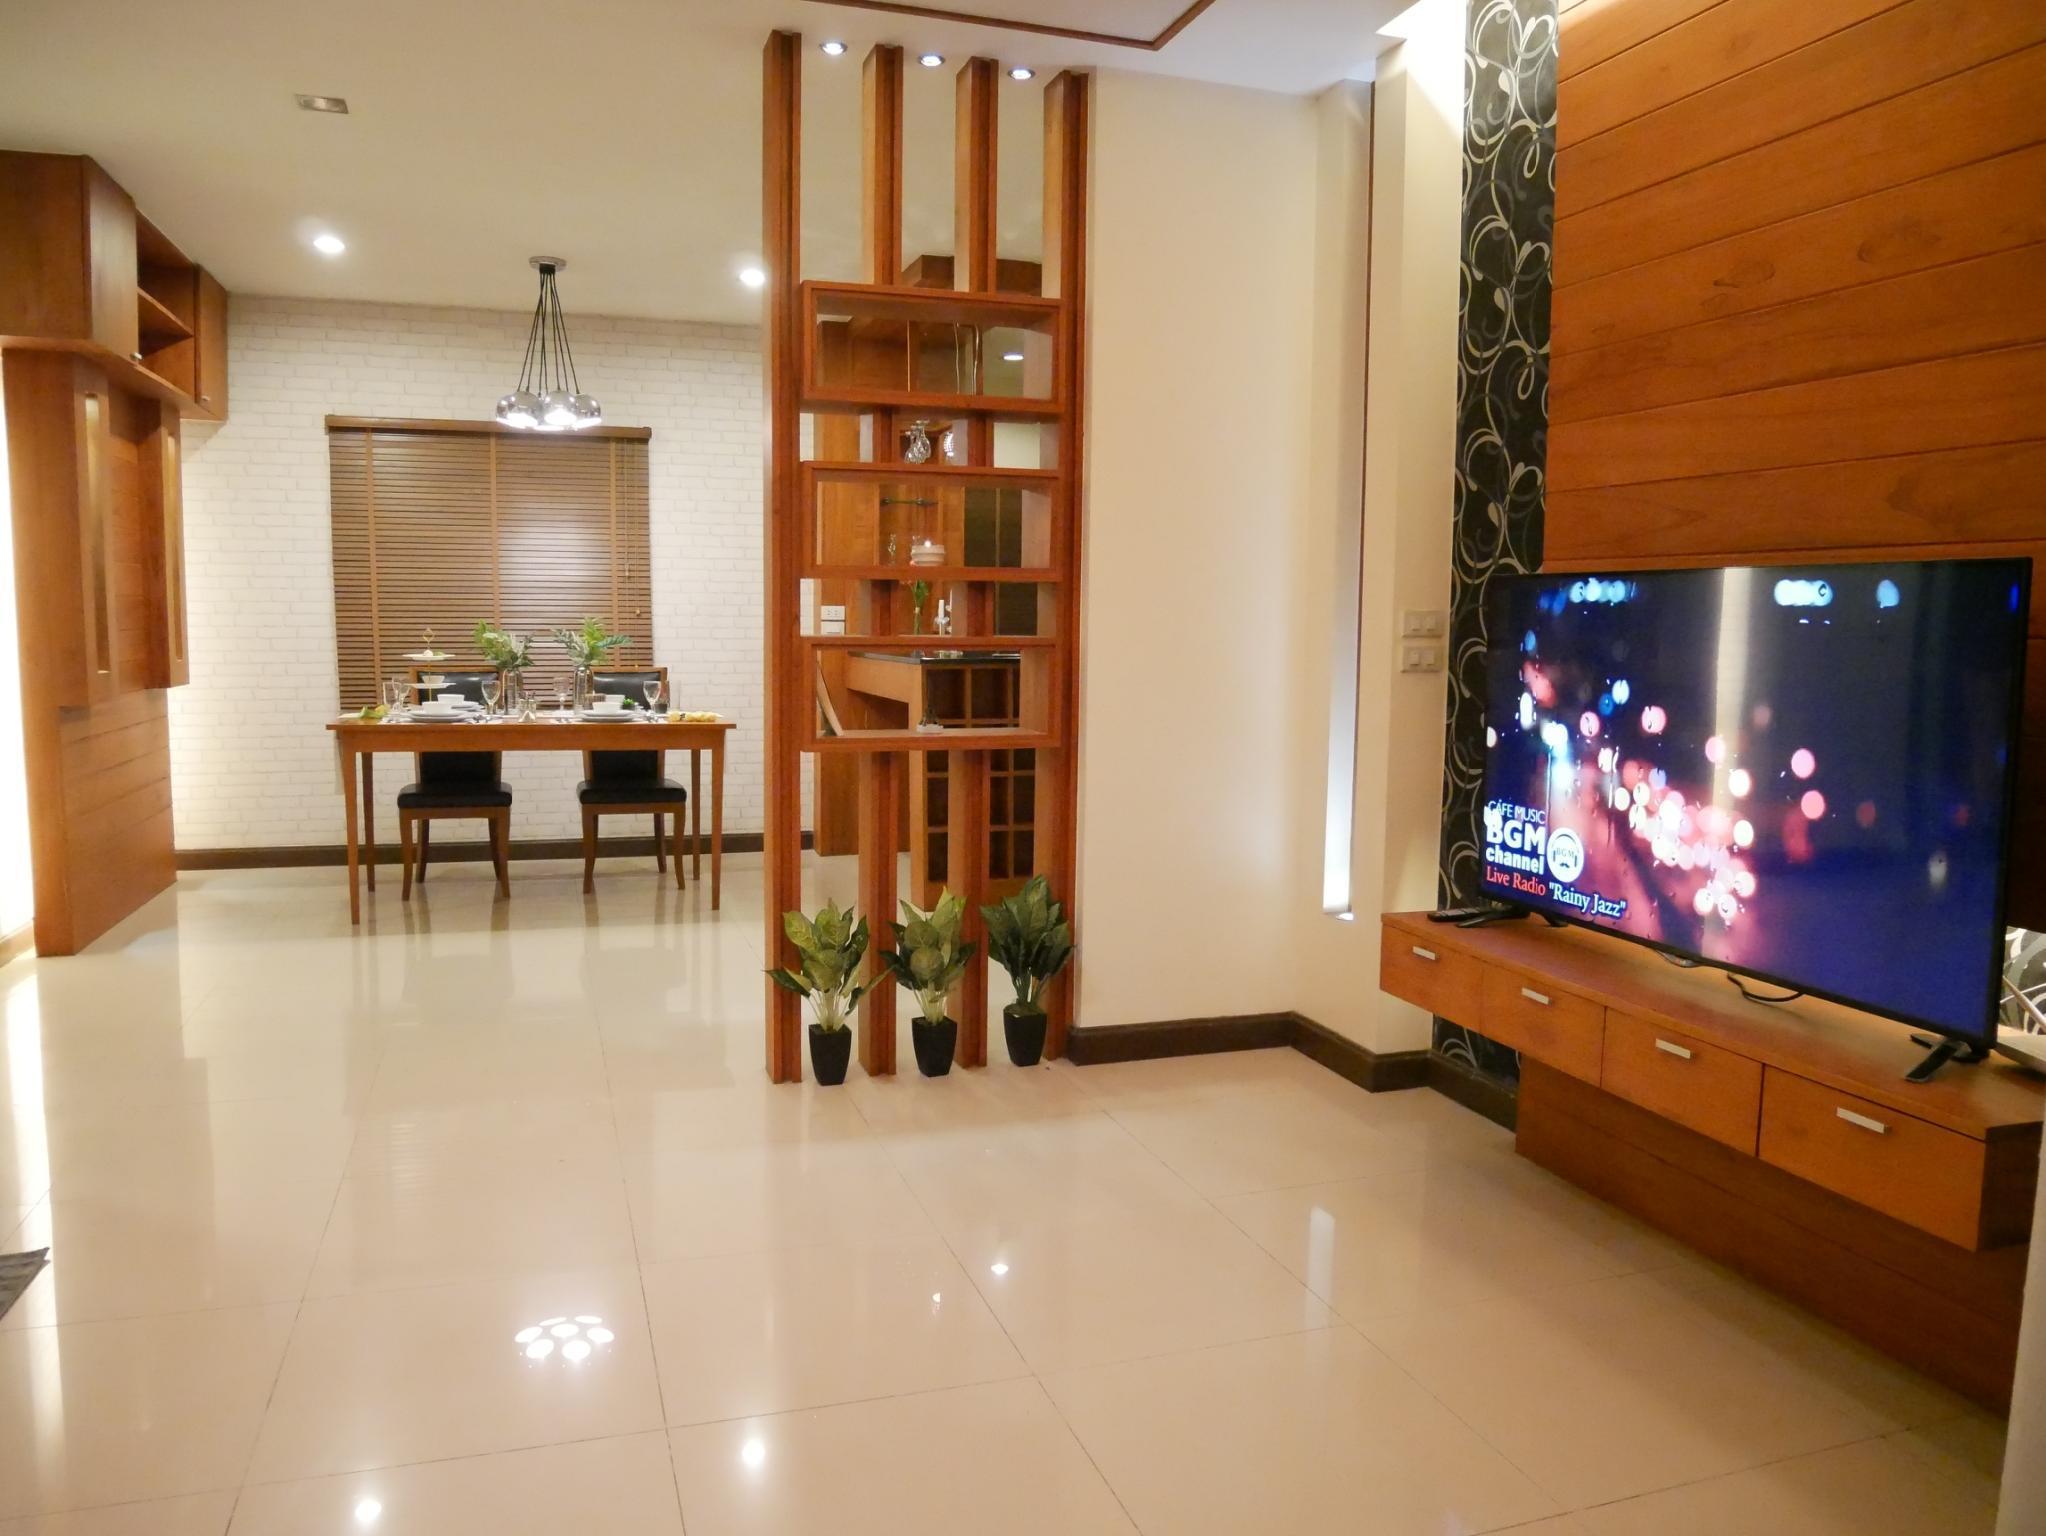 Chiang Mai Golden Teak Retro Modern House สตูดิโอ บ้านเดี่ยว 4 ห้องน้ำส่วนตัว ขนาด 196 ตร.ม. – ท่าศาลา